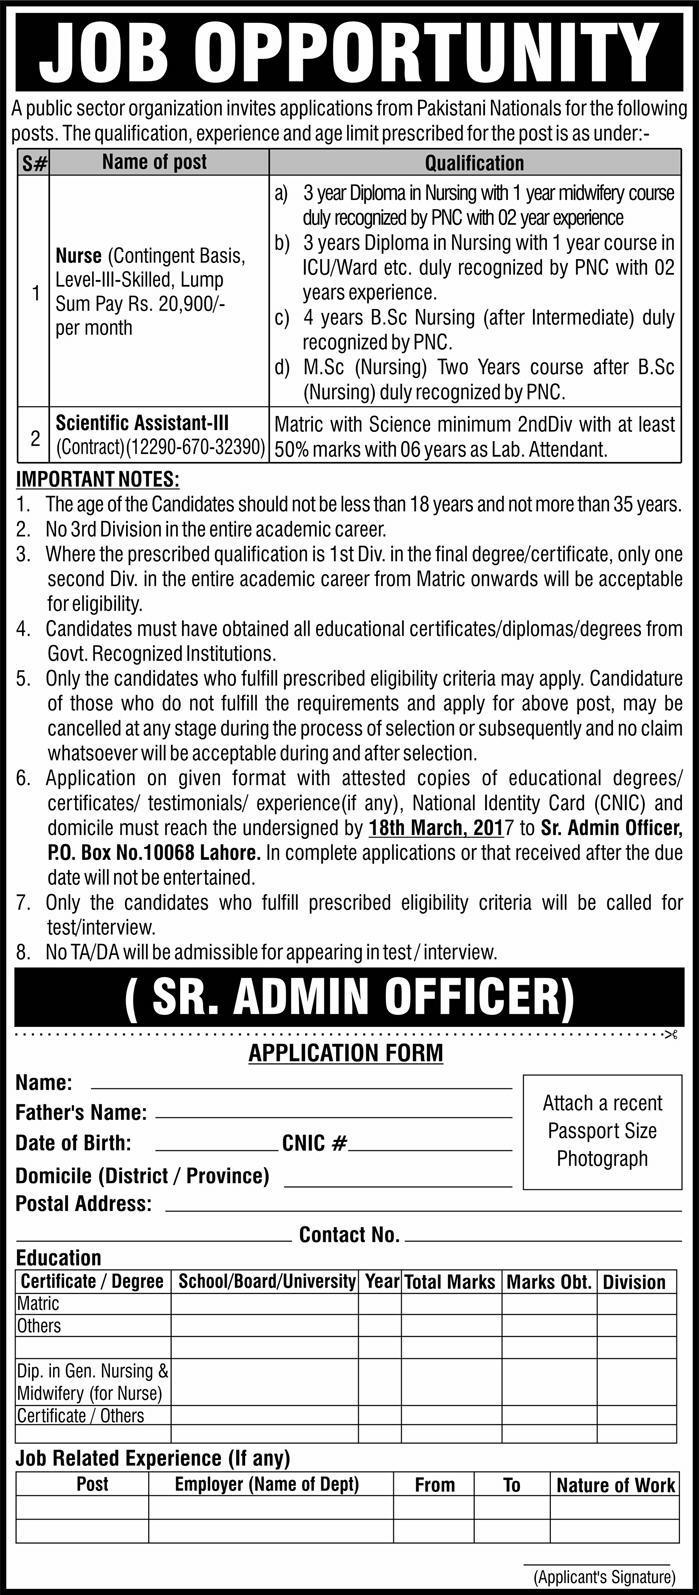 PO Box 10068 Lahore PAEC Jobs 2017 in INMOL Hospital